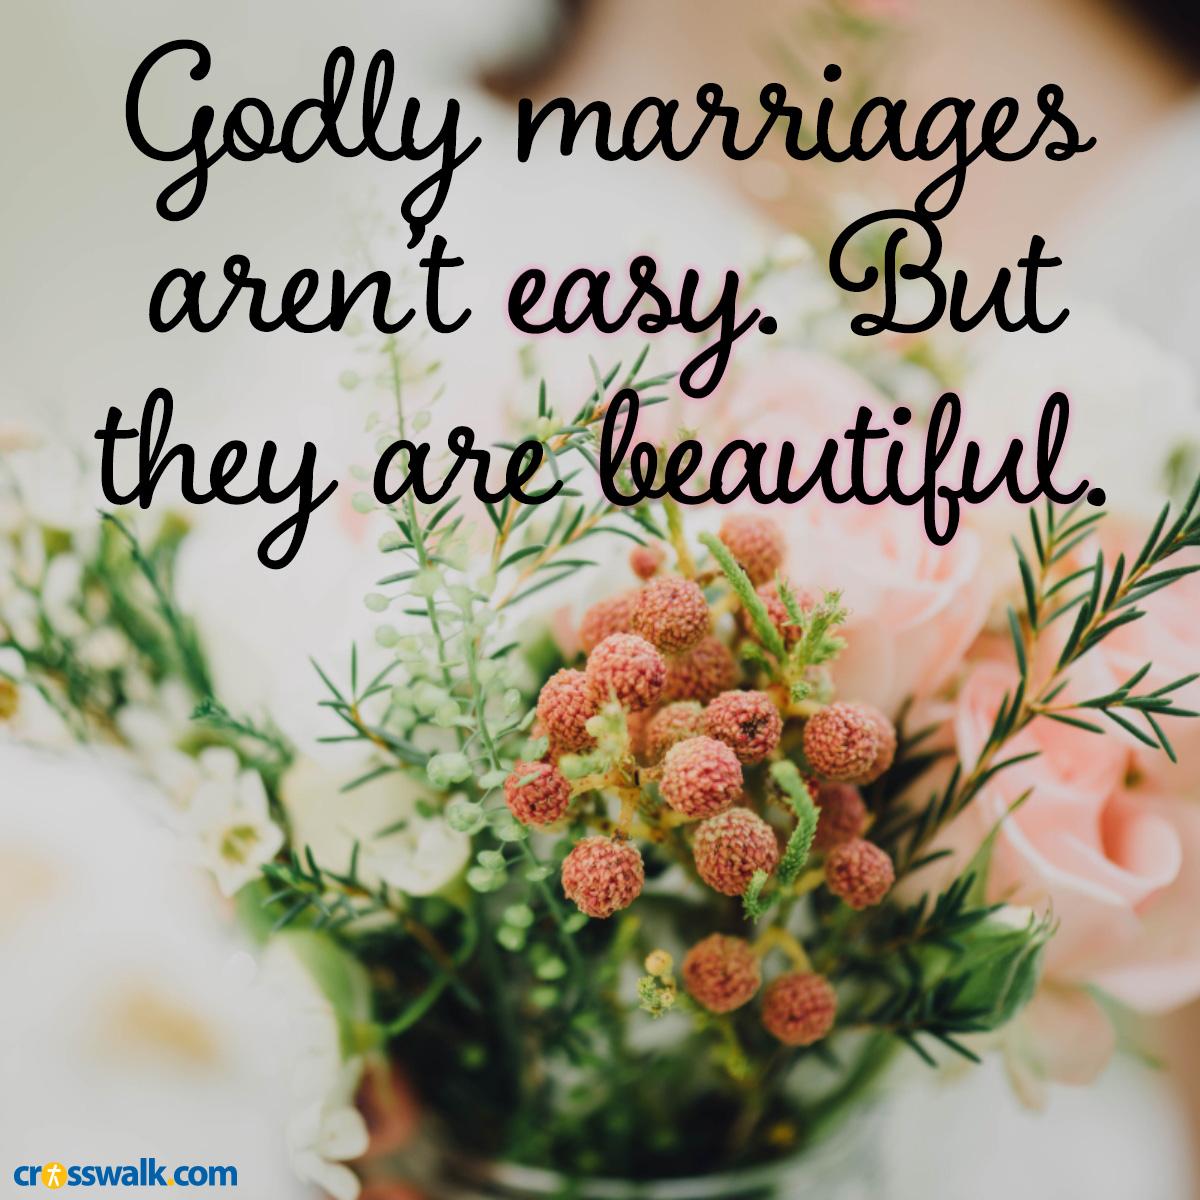 Godly marriage inspirational image